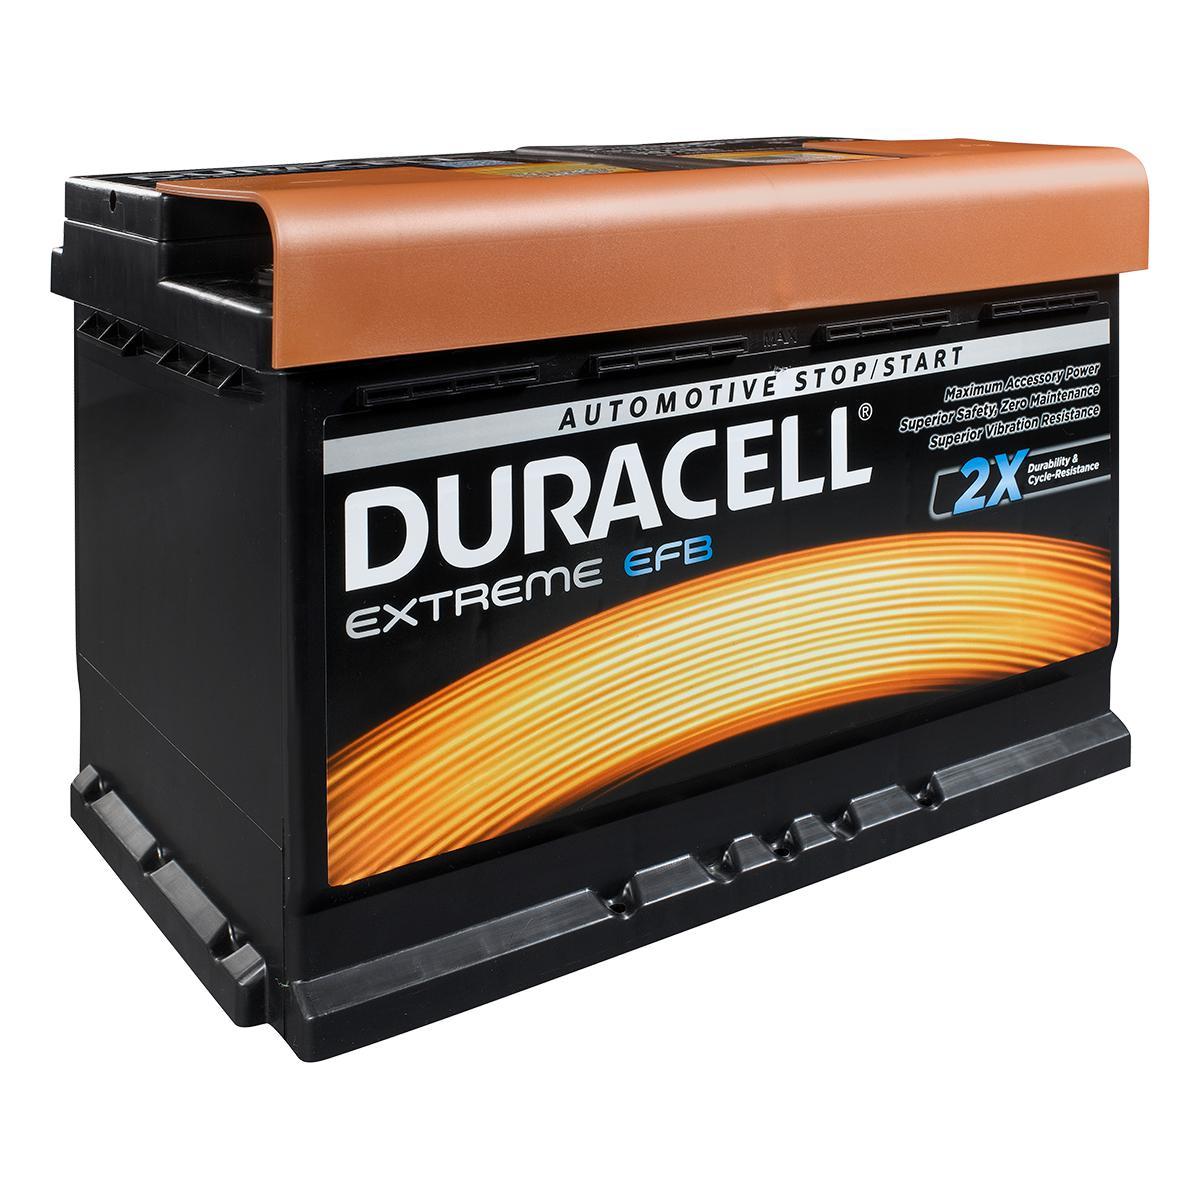 Duracell 096 / DE70 EFB Extreme Car Battery